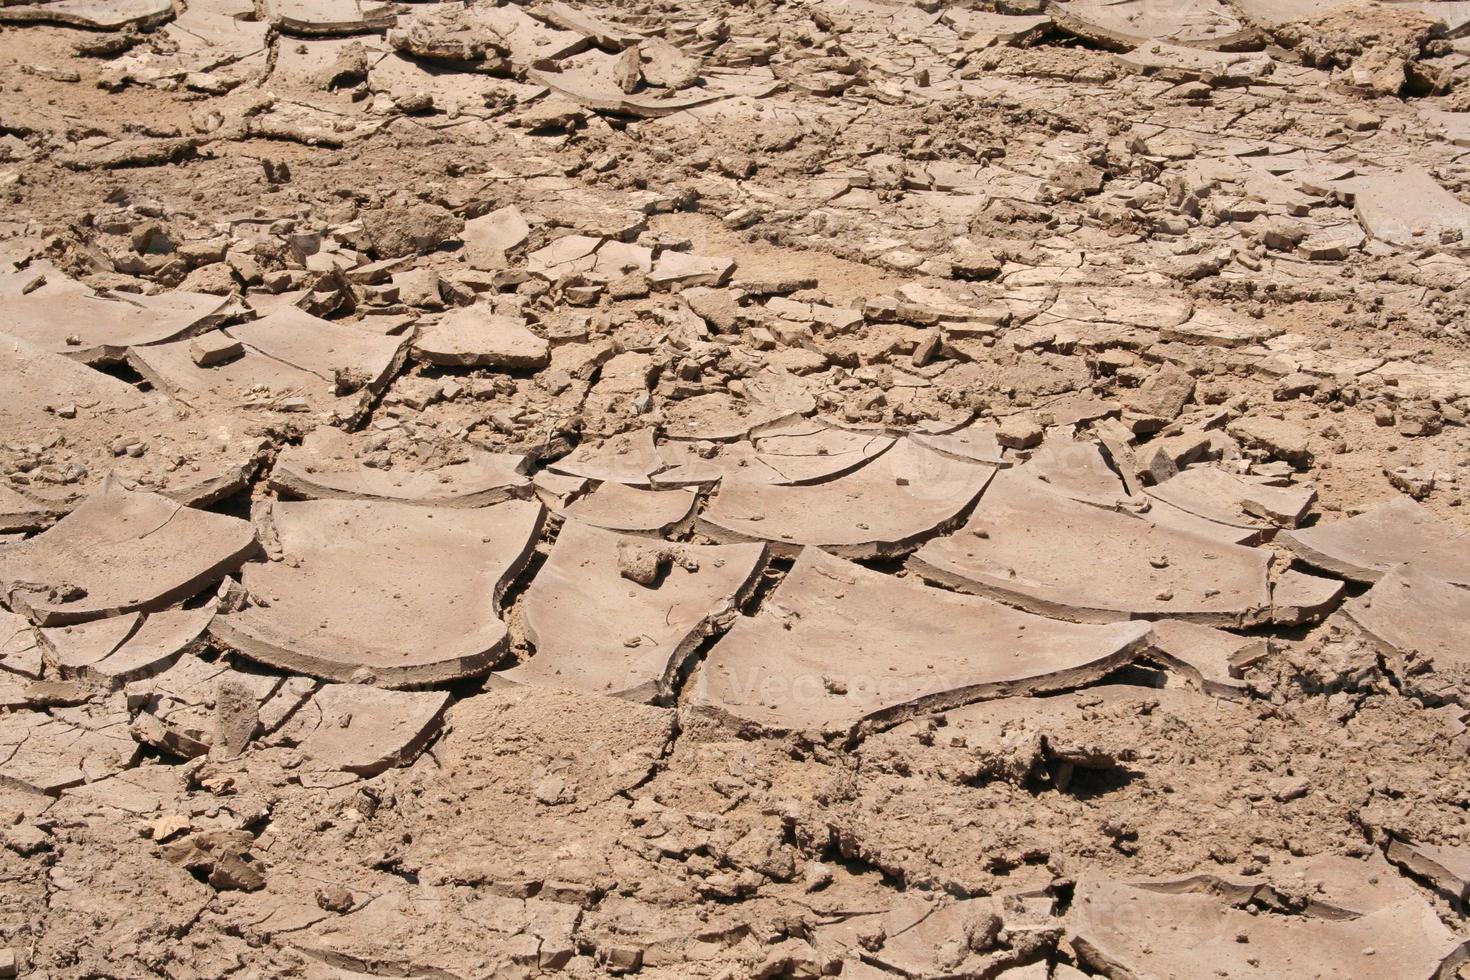 Lodo seco agrietado de fangoso Salt Road skeleton Coast, Namibia foto